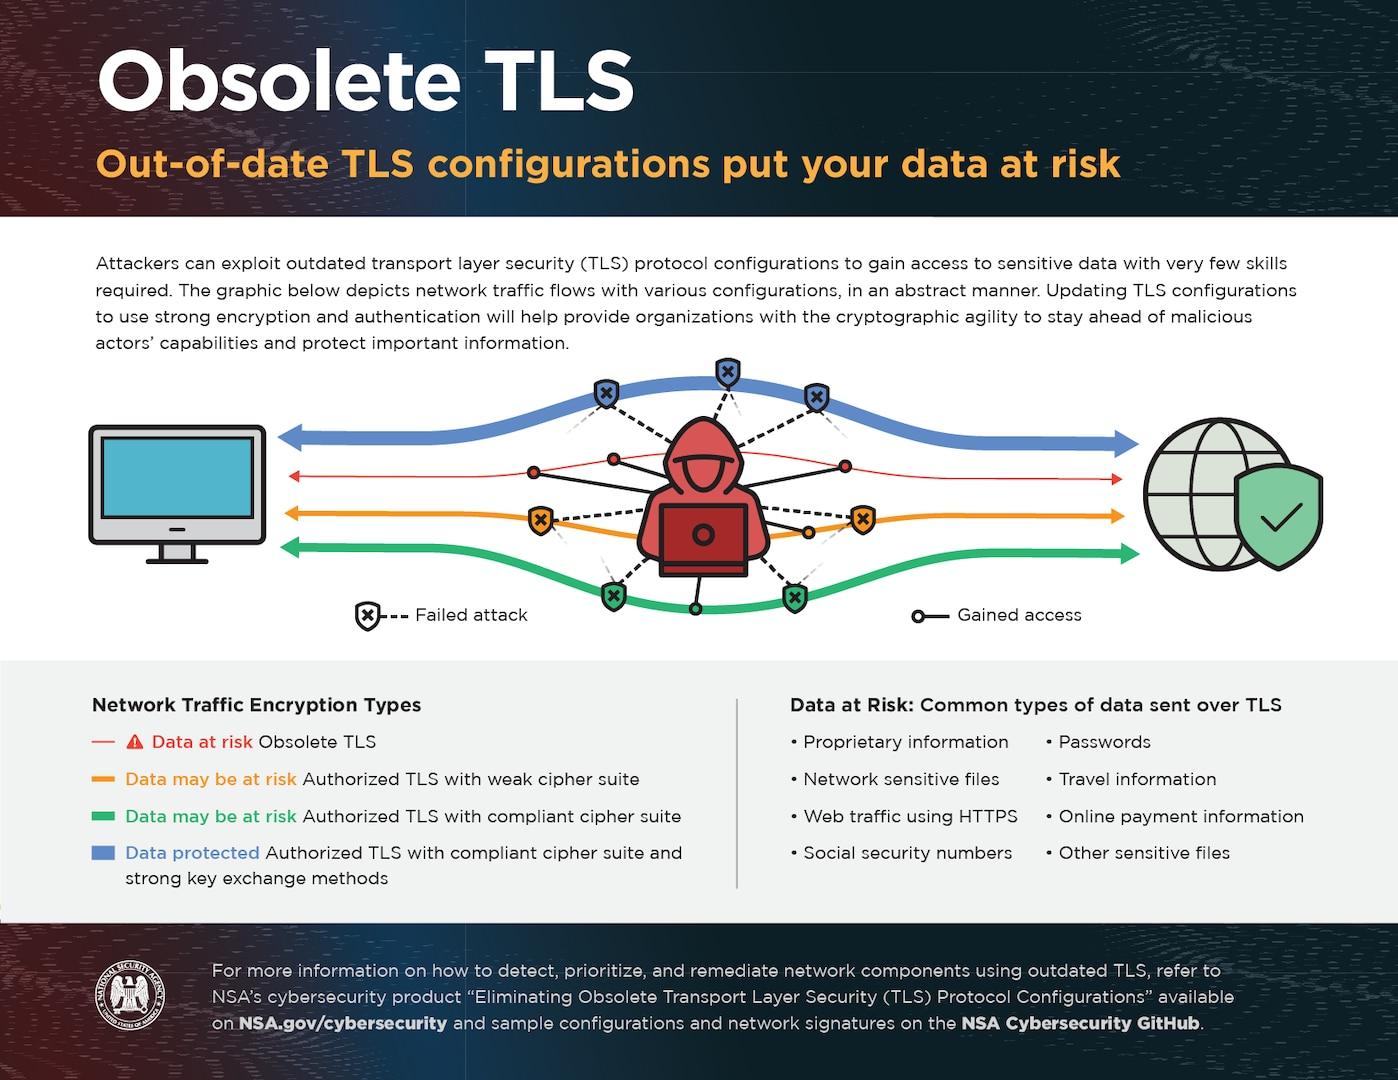 Eliminating Obsolete TLS Infographic